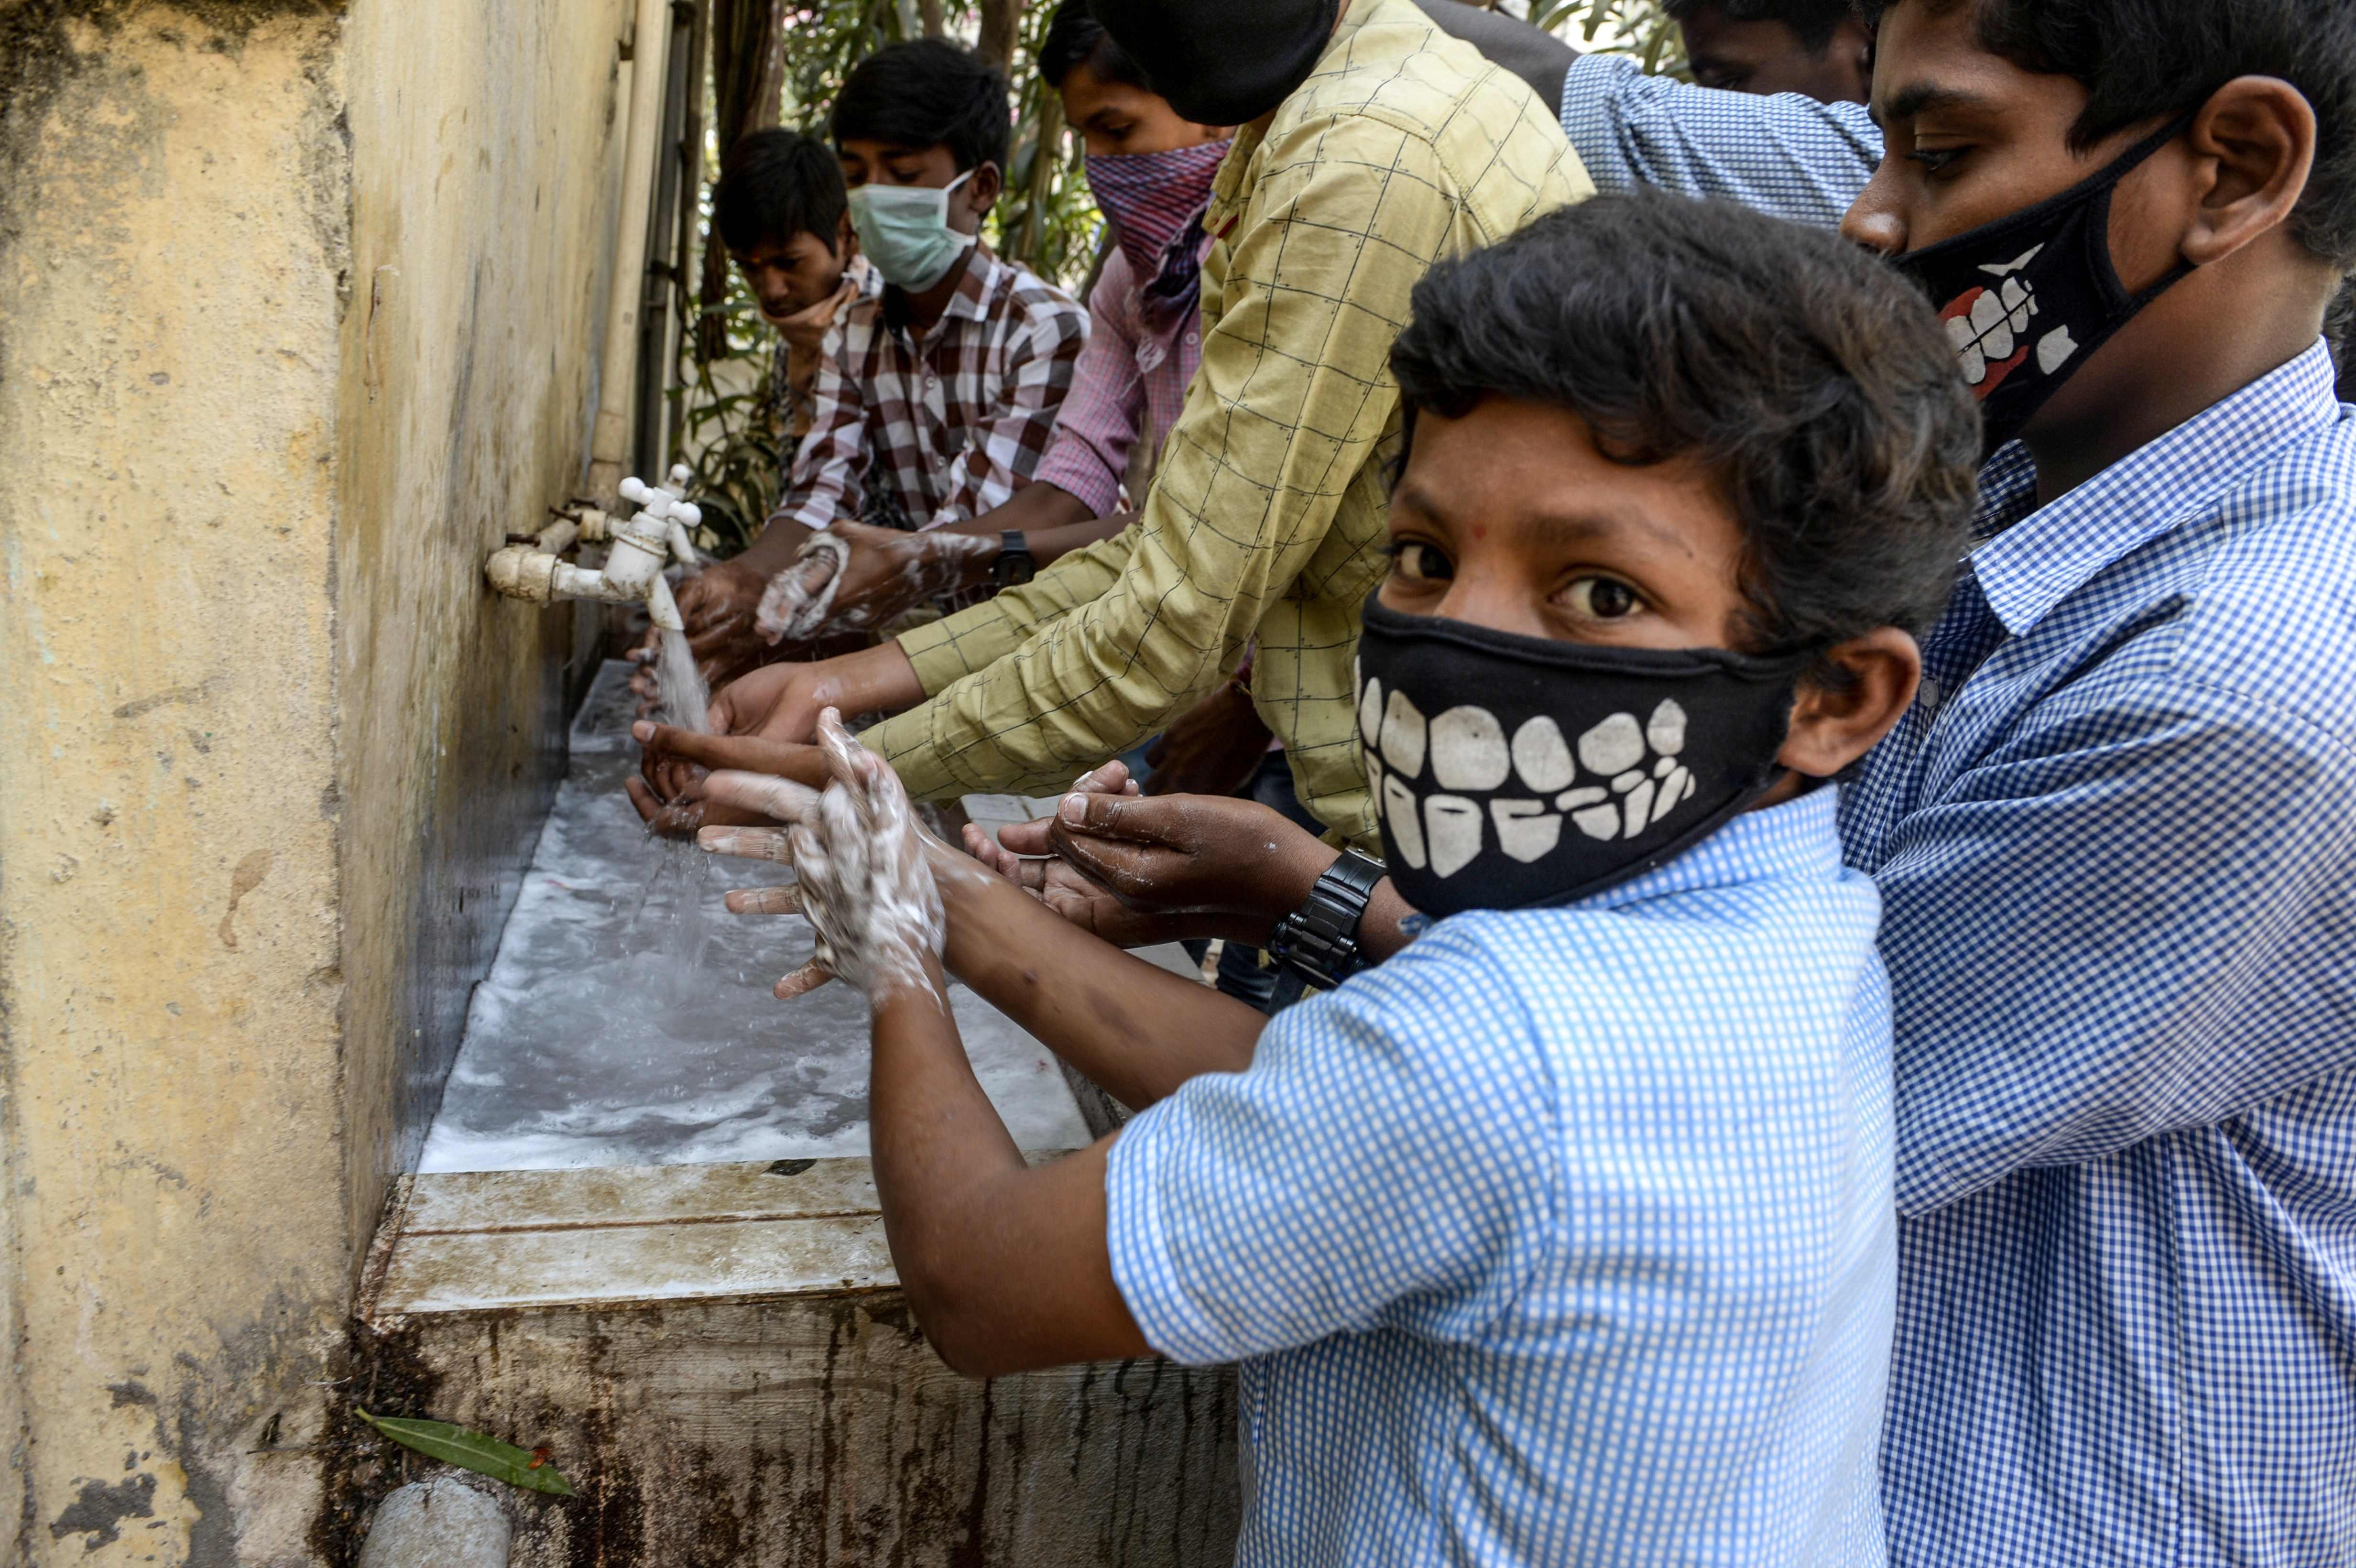 Coronavirus cases in India rise to 28, including 16 Italians | Daily ...